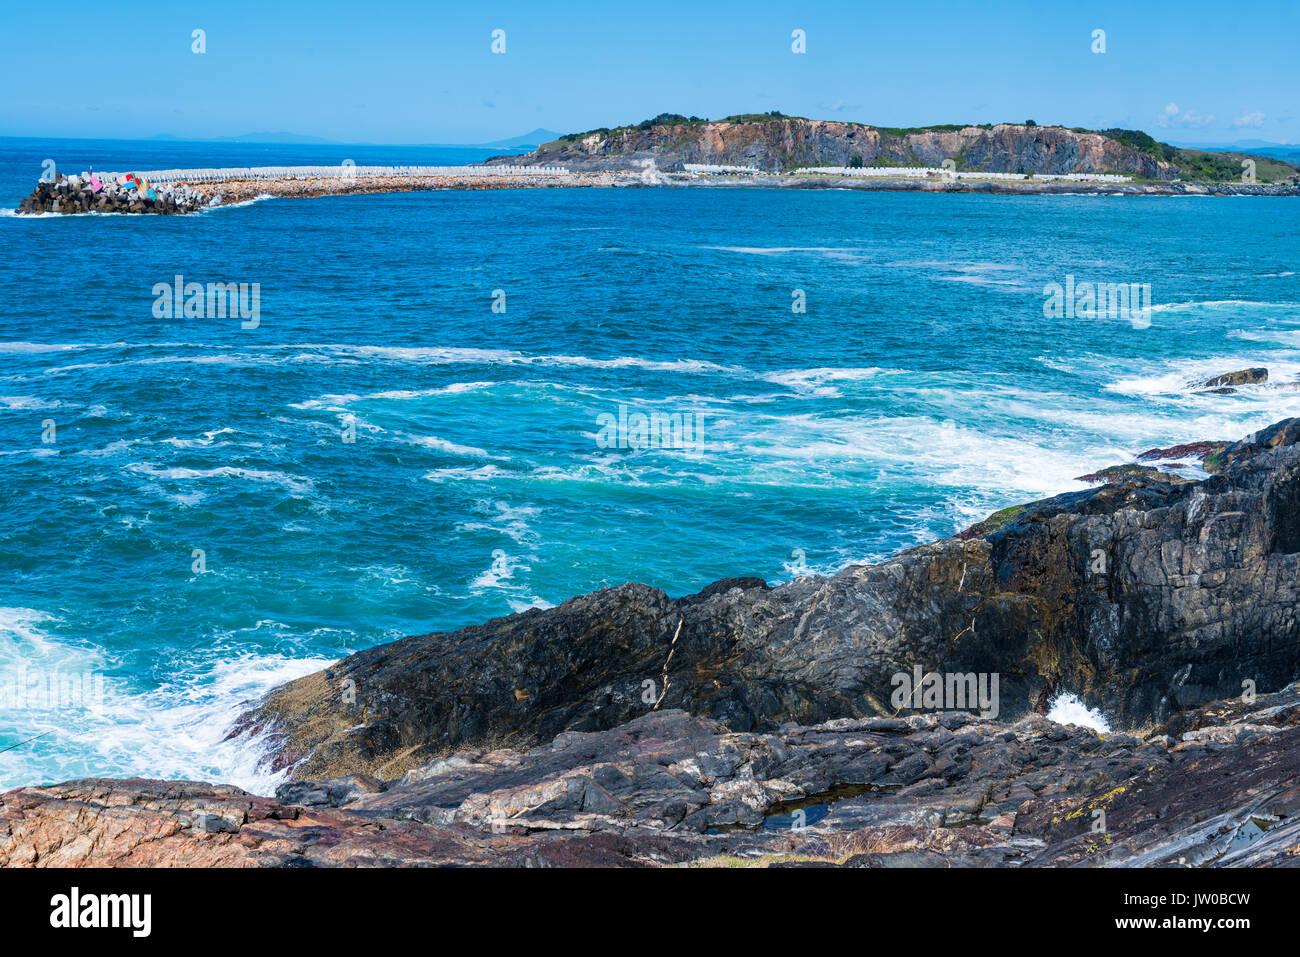 Views from Mutton bird island, Coffs Harbour, NSW, Australia. - Stock Image